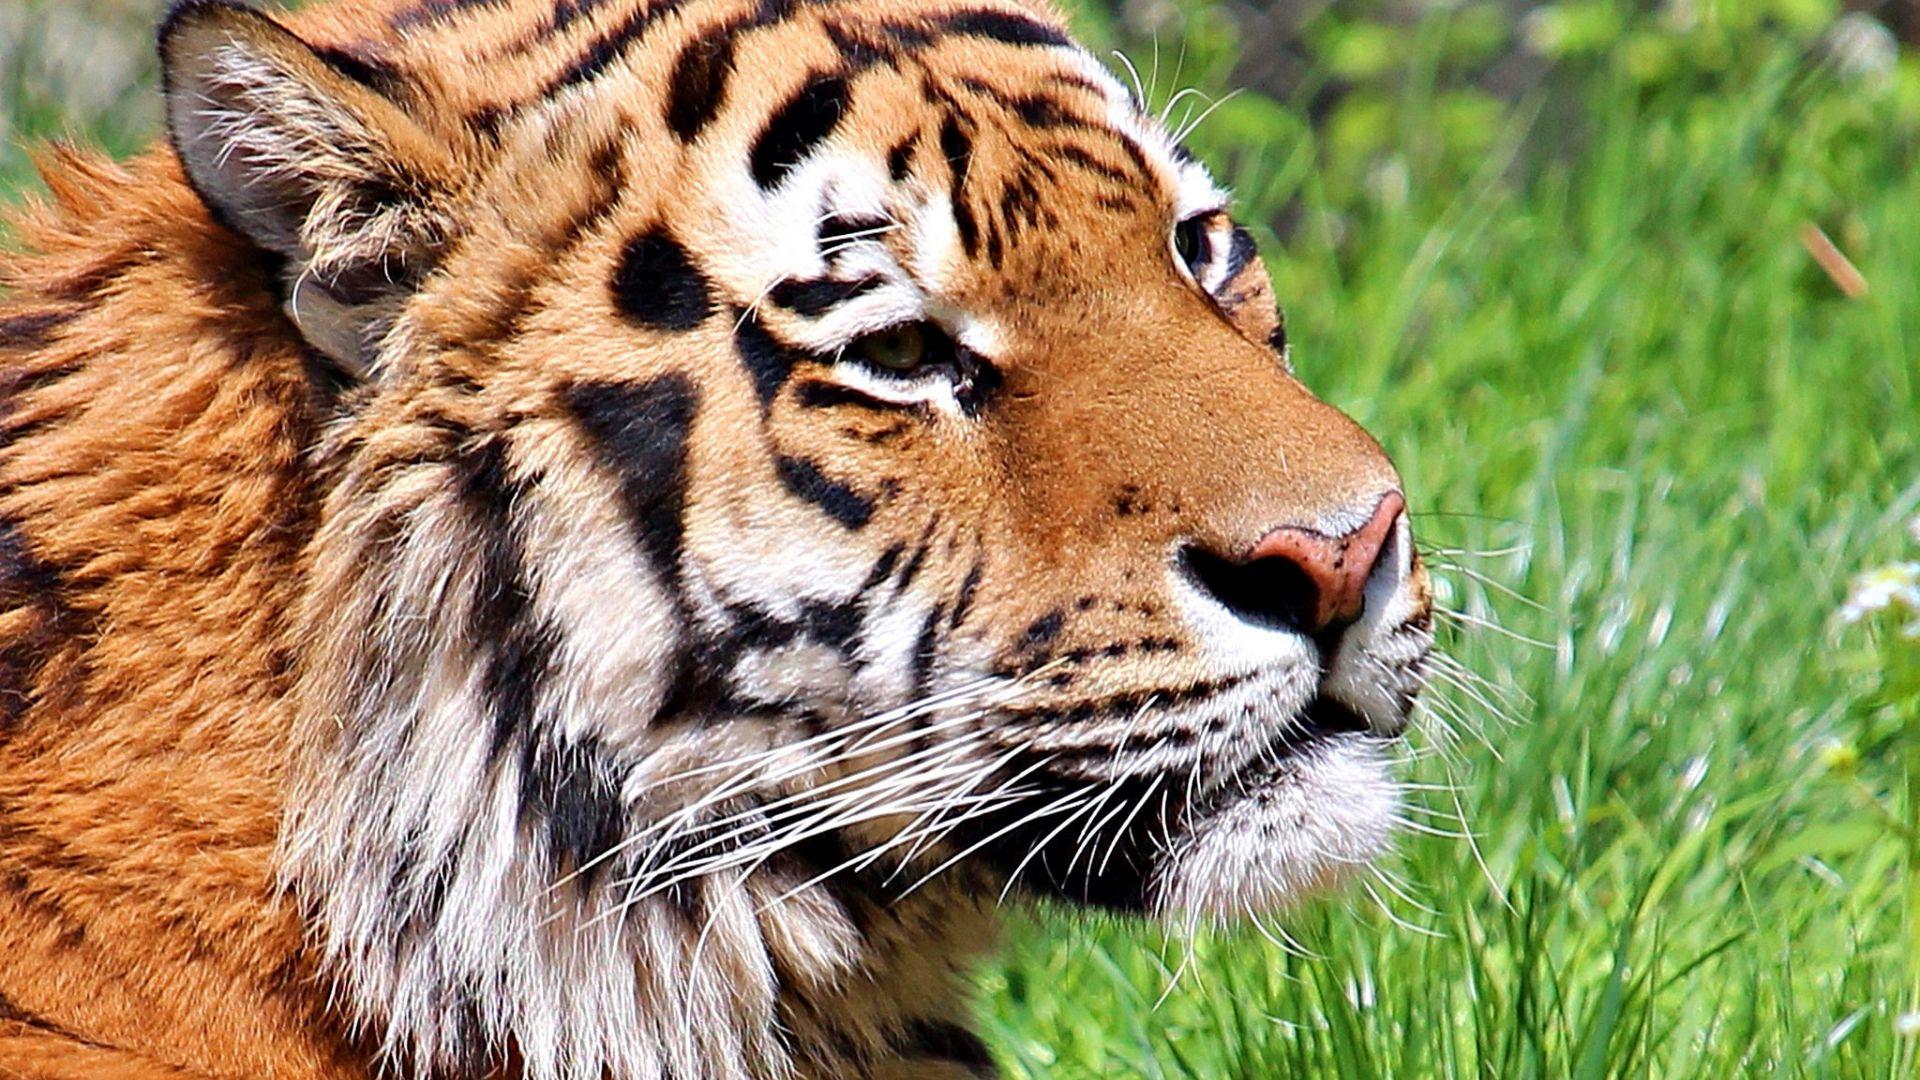 Wallpaper Tiger muzzle, predator, wild animal